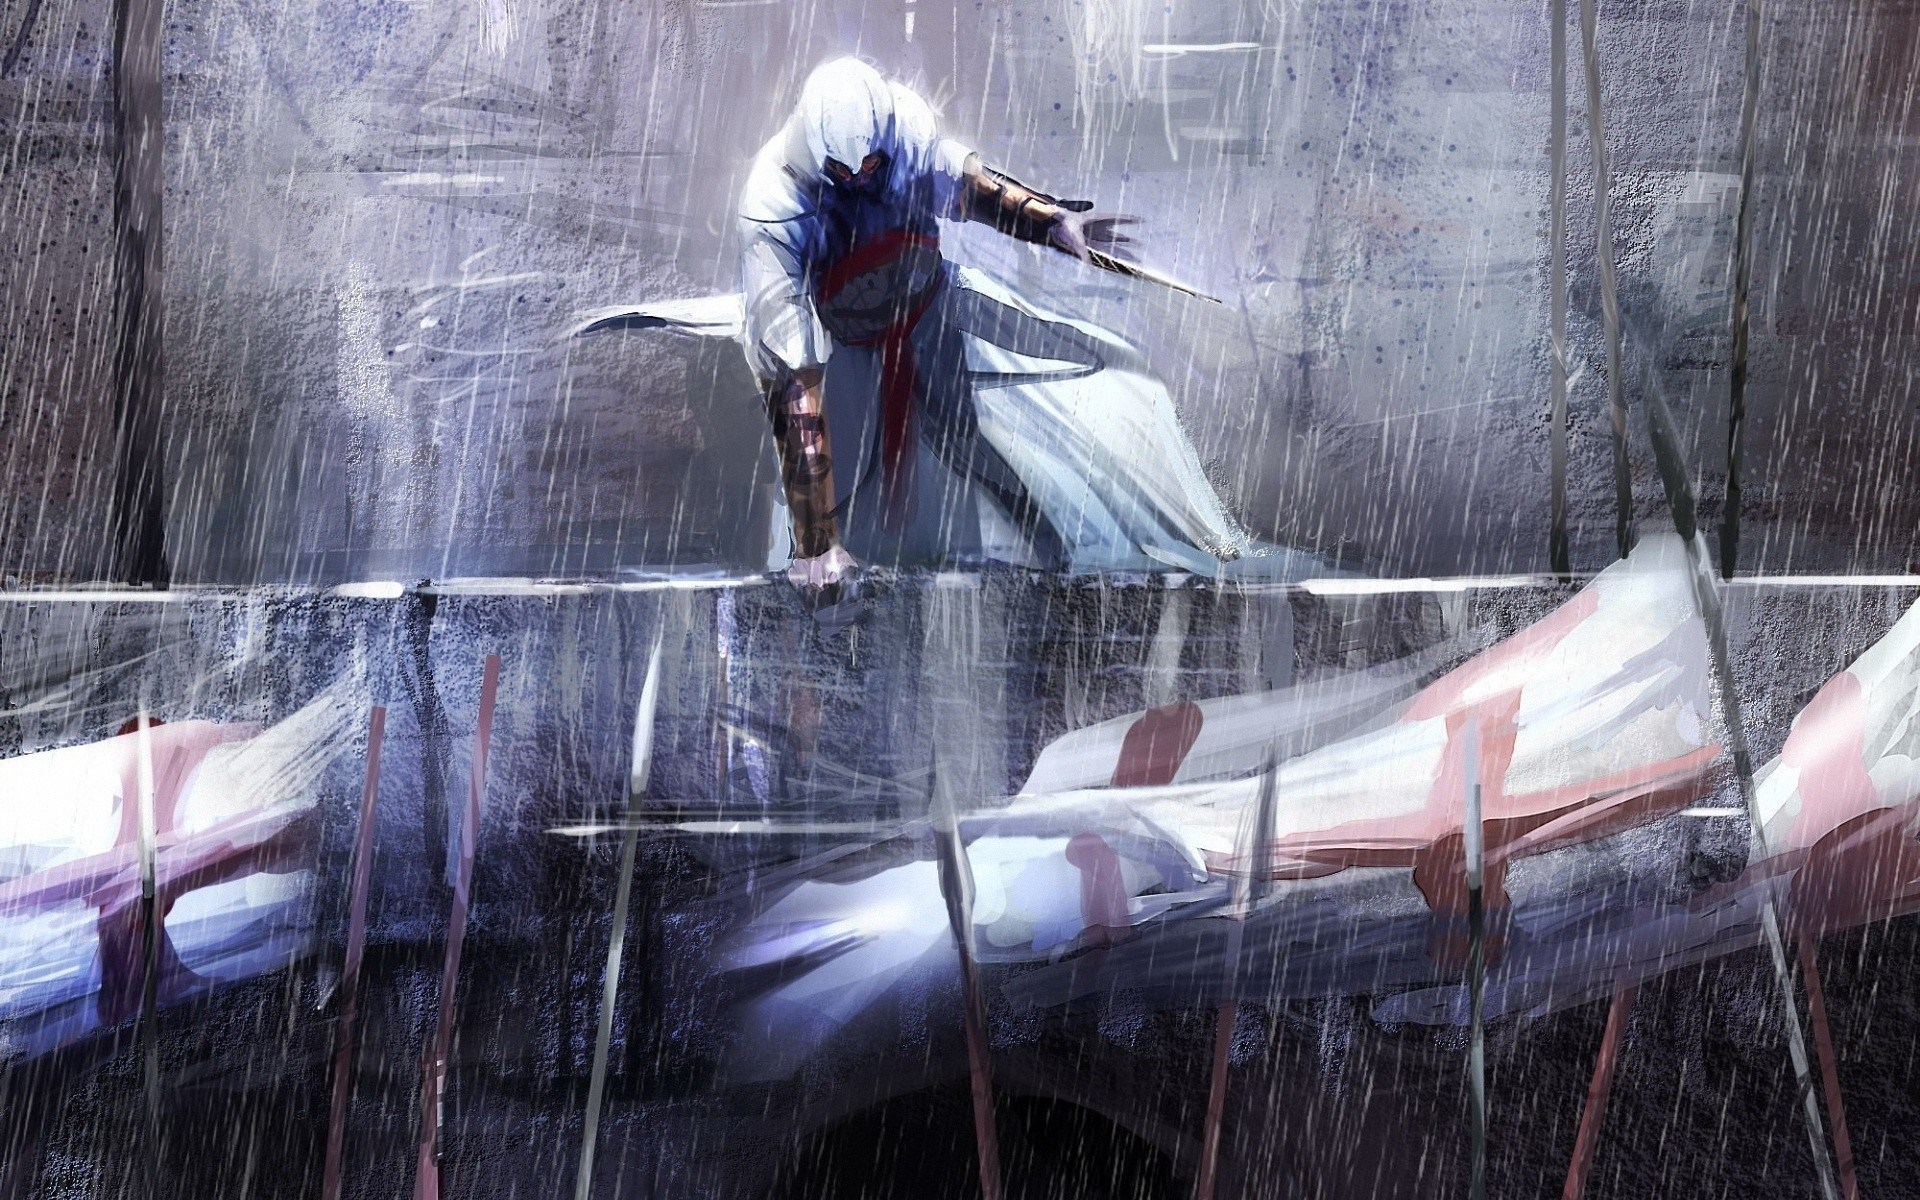 Assassins Creed Video Game Artwork